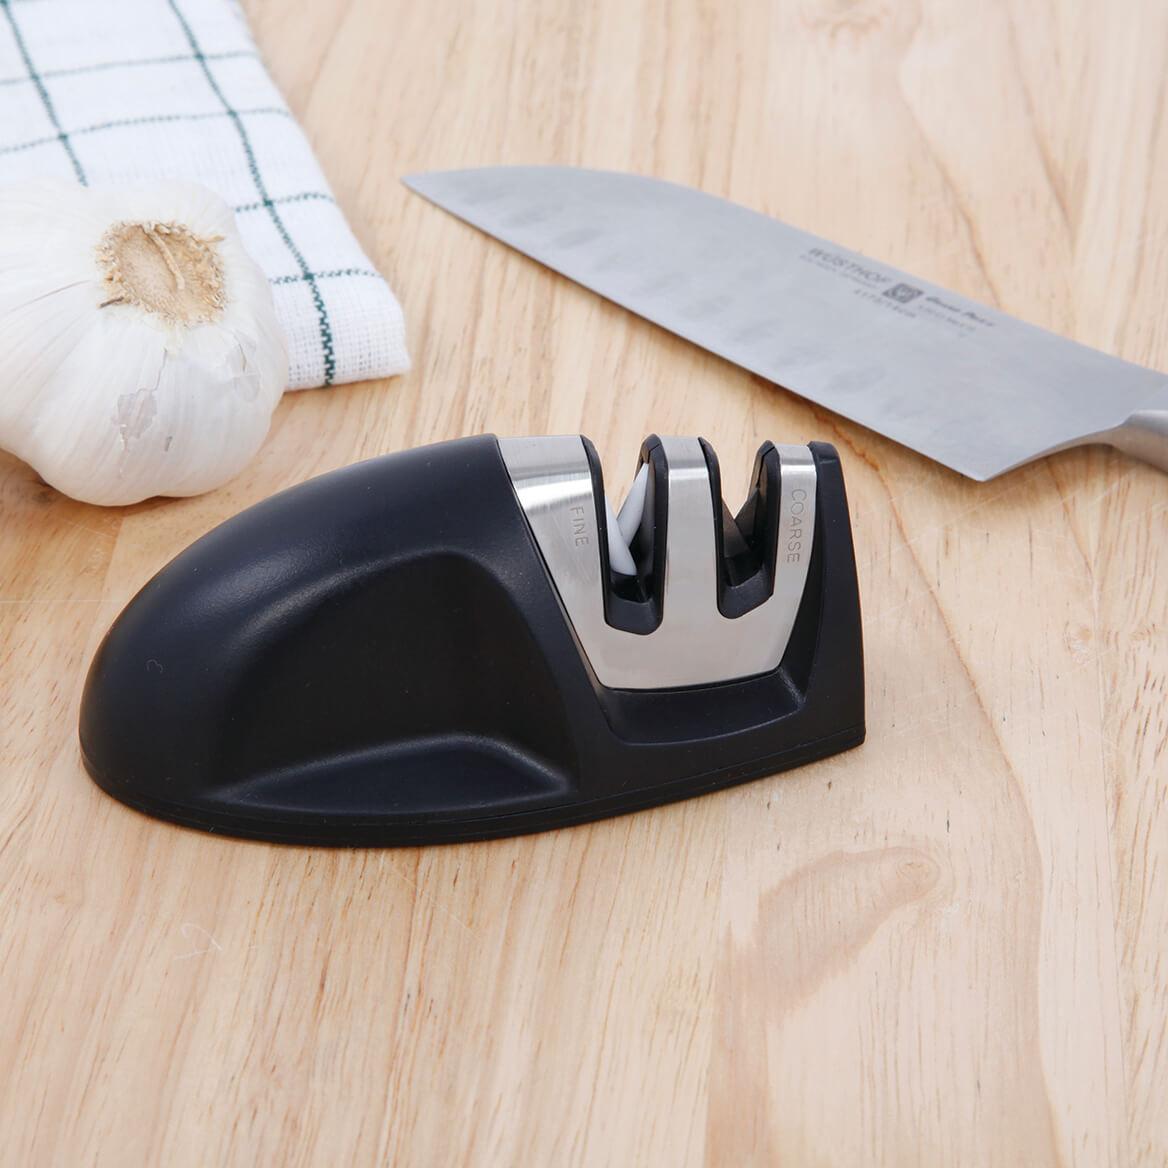 Perfect Edge Knife Sharpener-369972